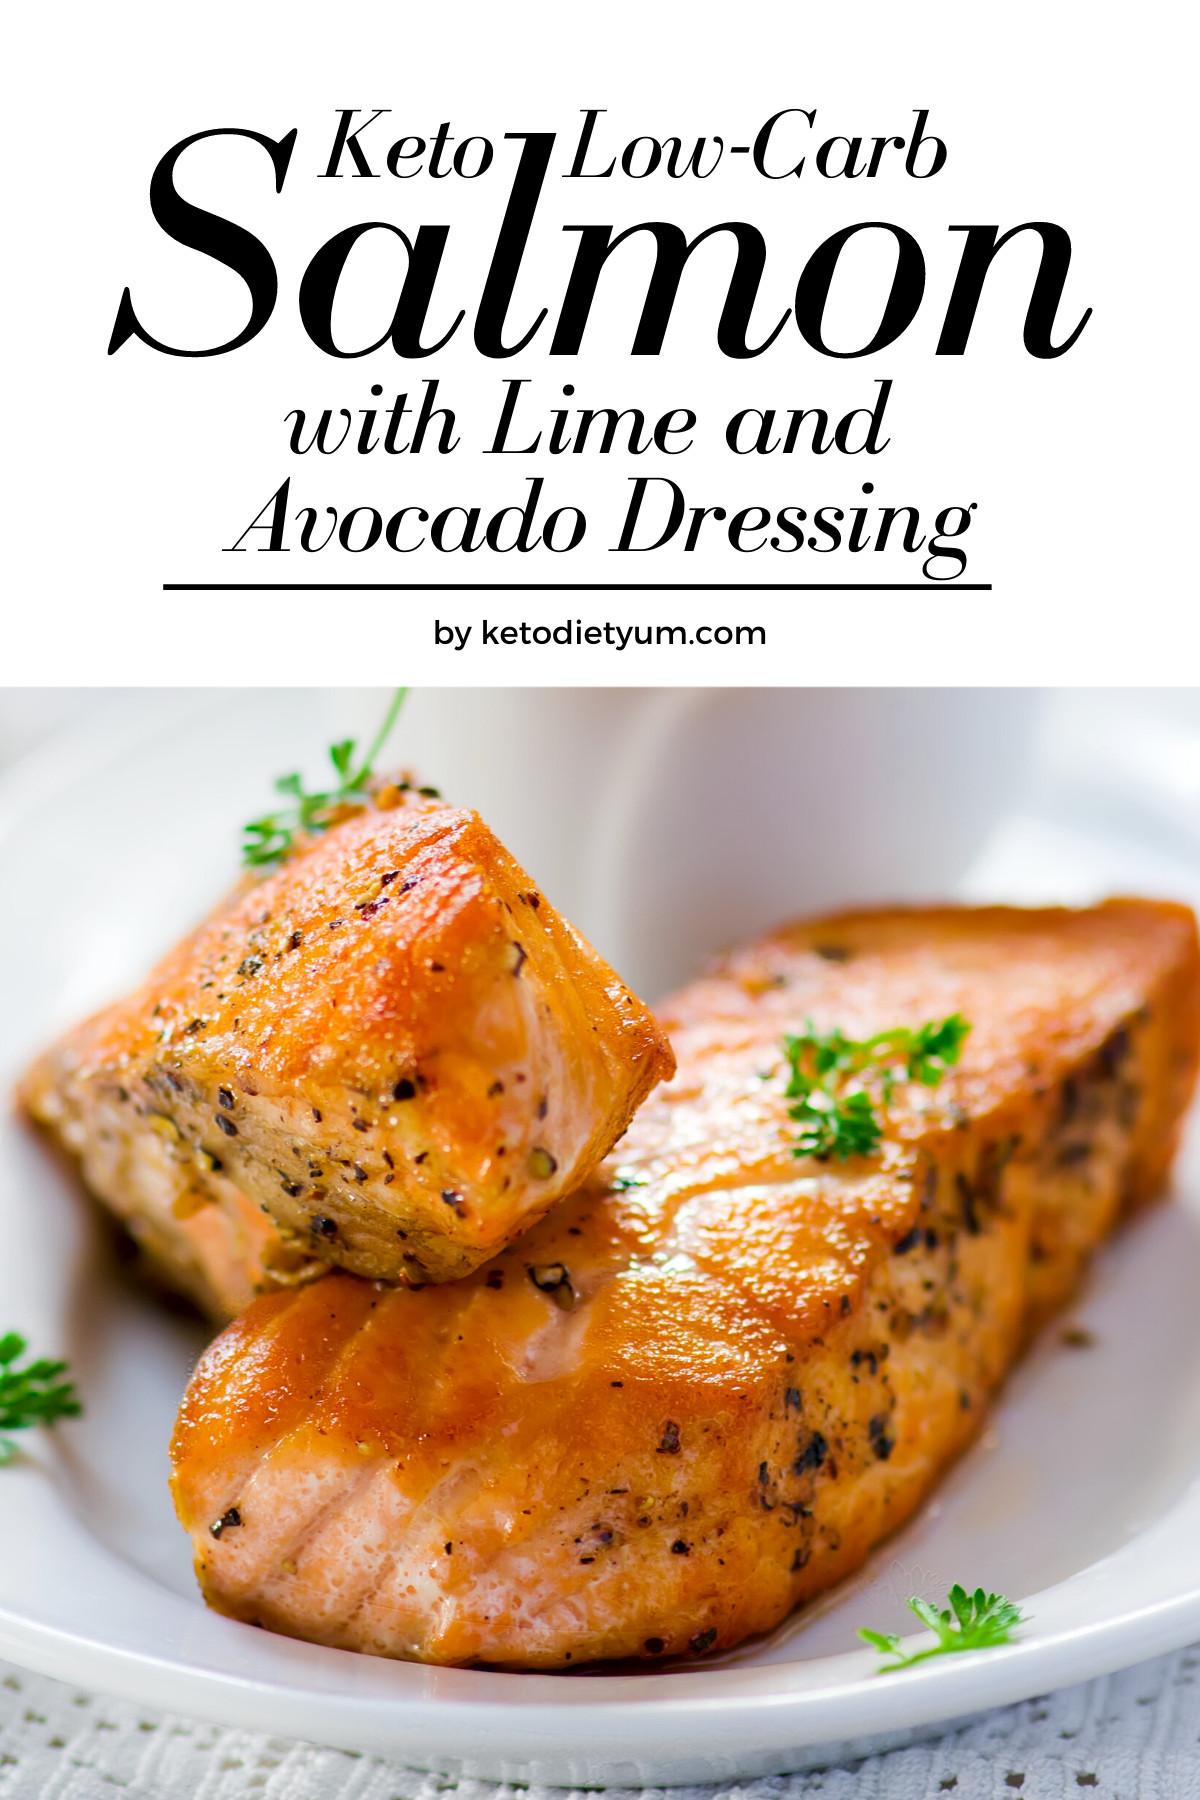 Low Cholesterol Salmon Recipes  Keto Salmon with Avocado & Lime Recipe